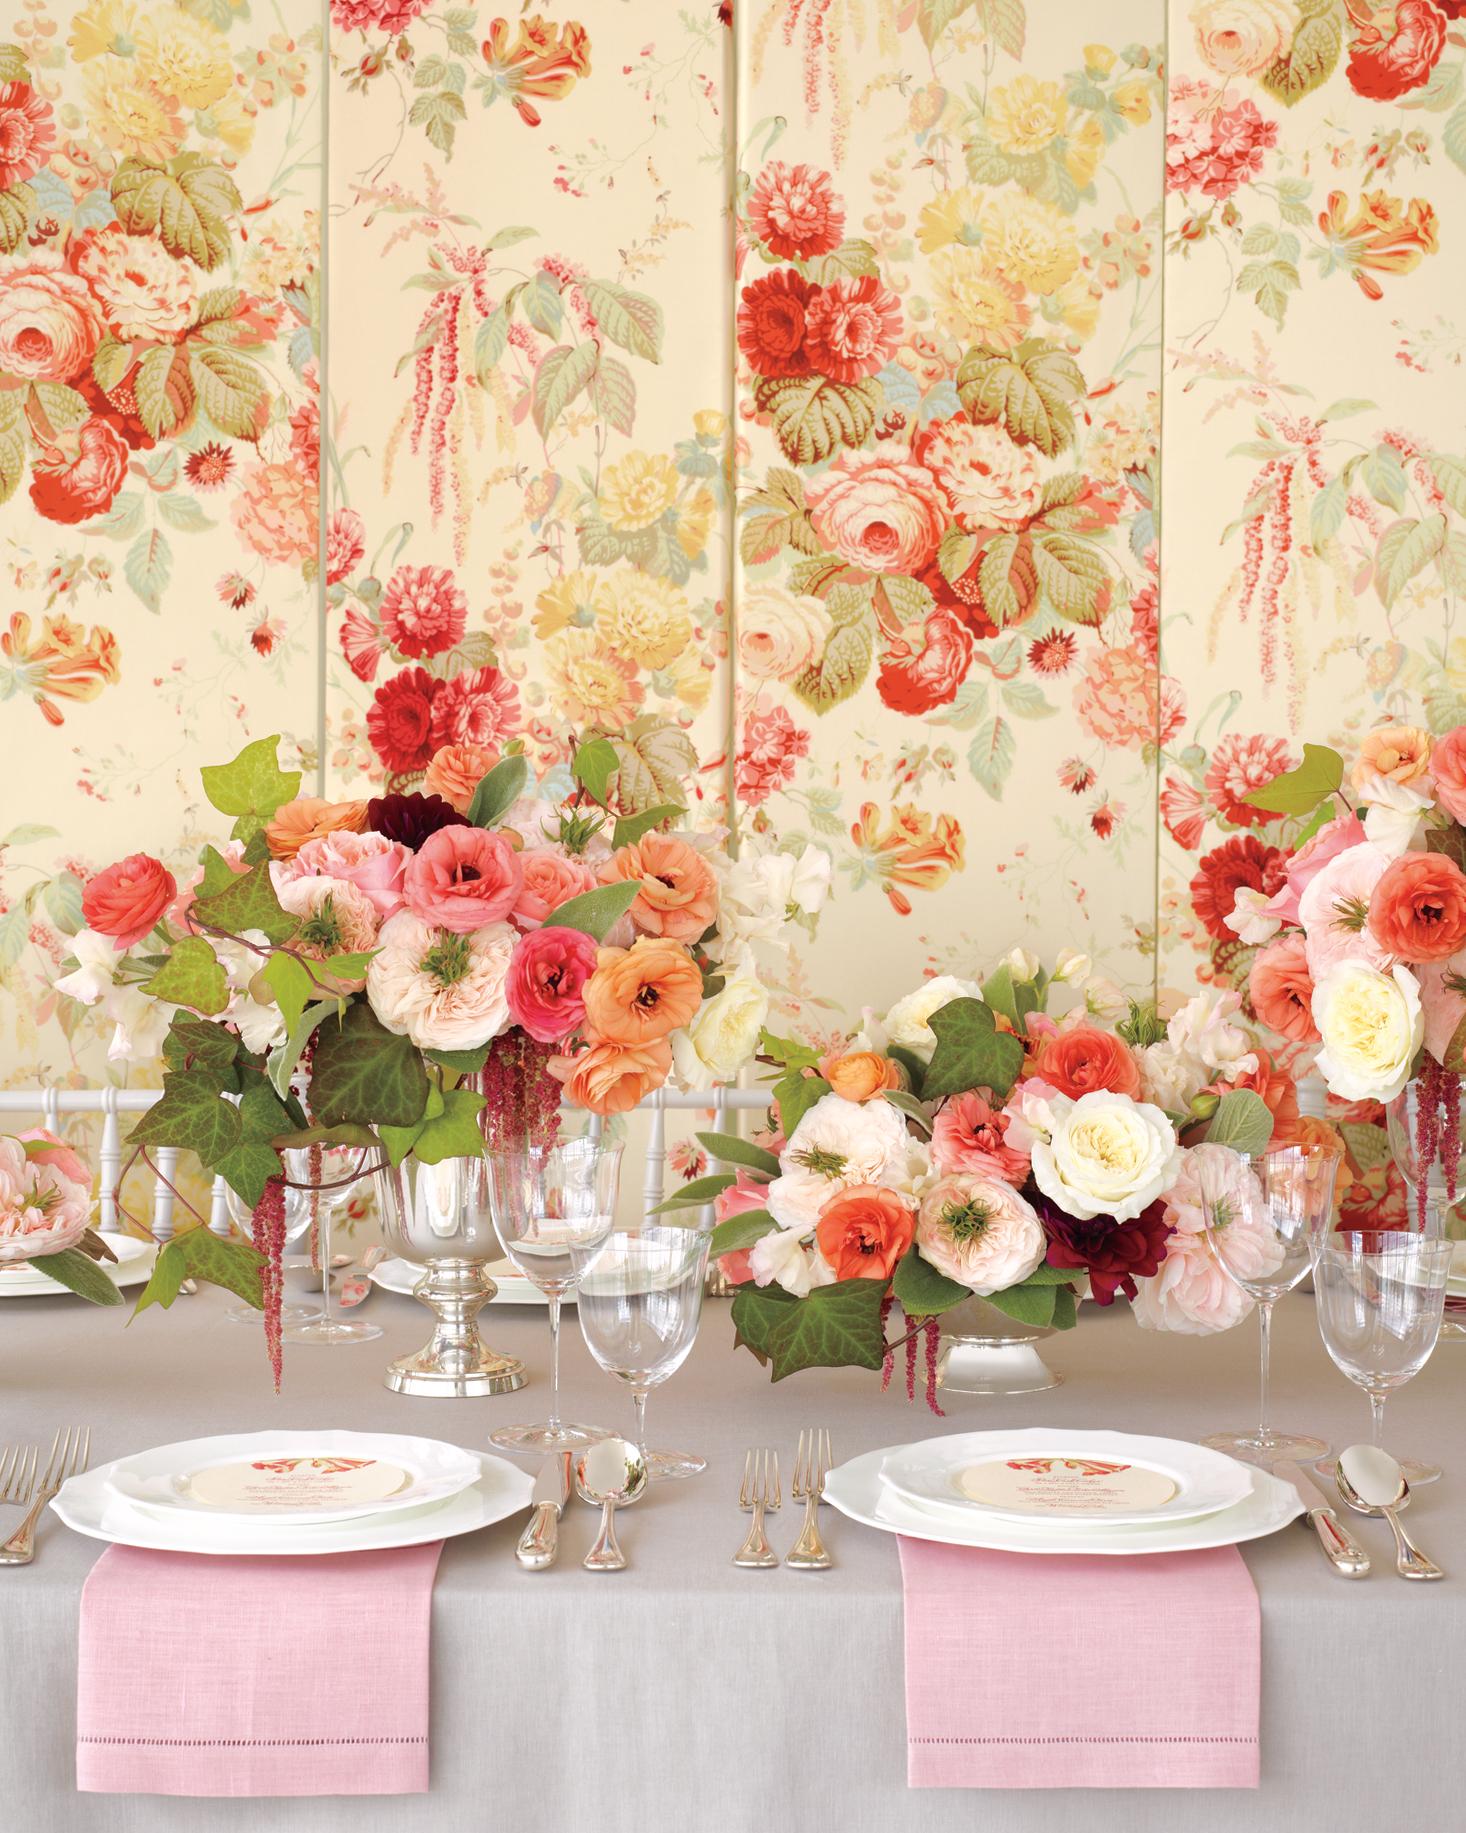 fabric-flowers-chintzc1-md108763.jpg